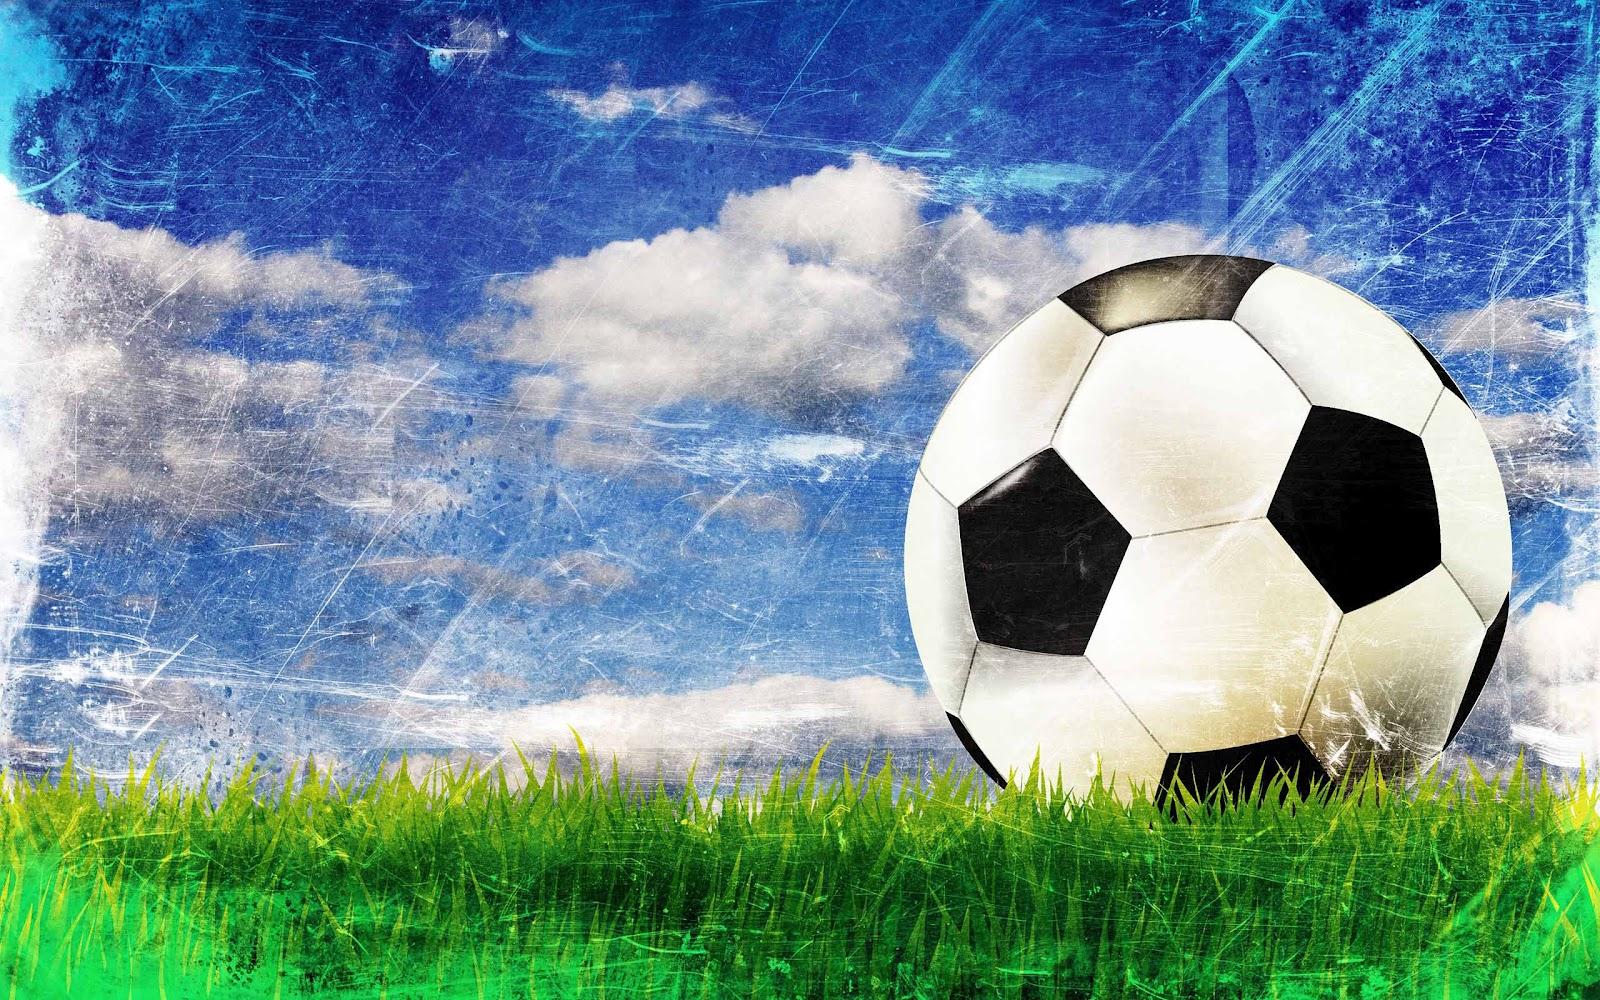 http://2.bp.blogspot.com/-sCC9Z49uGOI/T2YlVHhsekI/AAAAAAAAb_c/DsglWXmgd68/s1600/Voetbal-achtergronden-hd-voetbal-wallpapers-sport-01.jpg